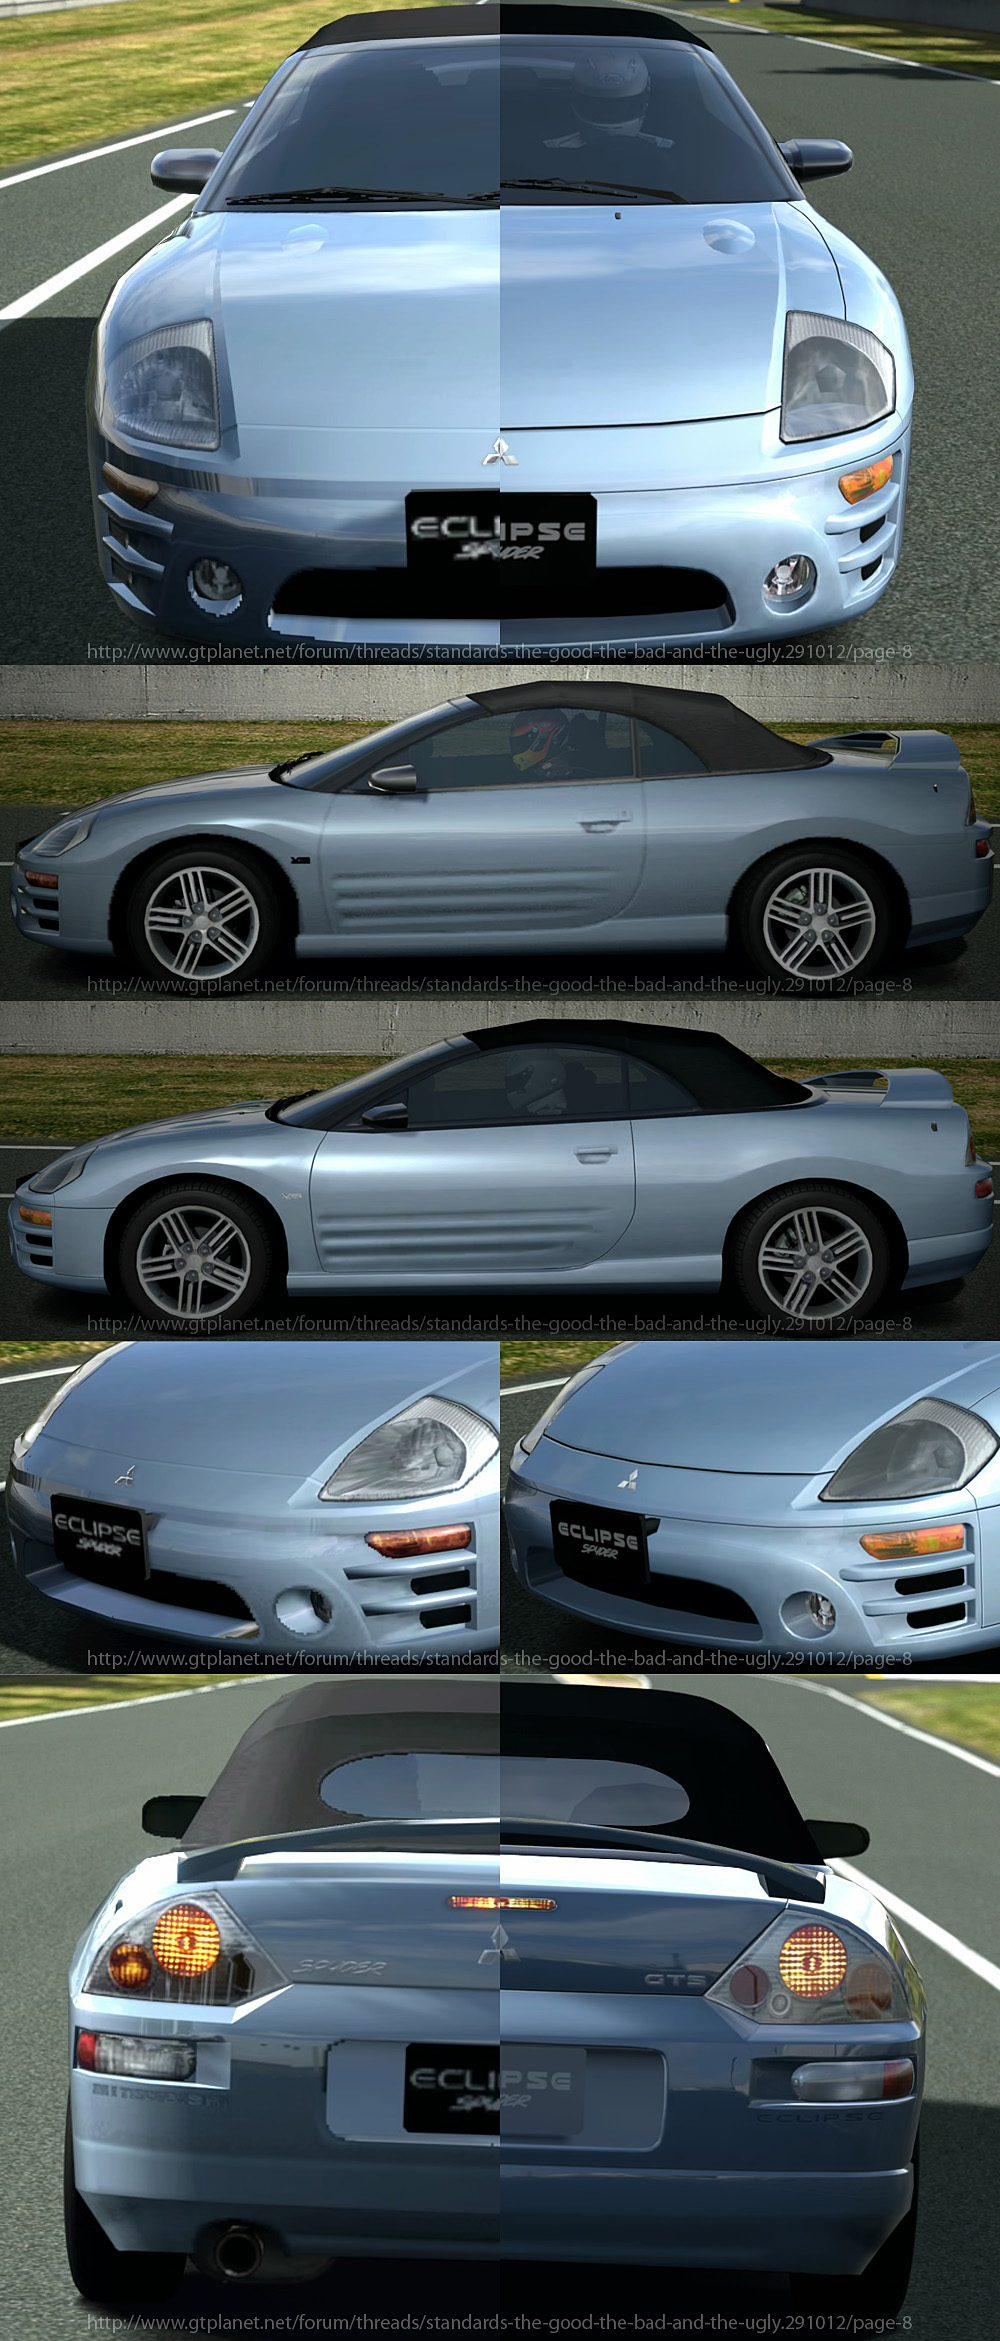 Eclipse Spyder GTS 03_041.jpg